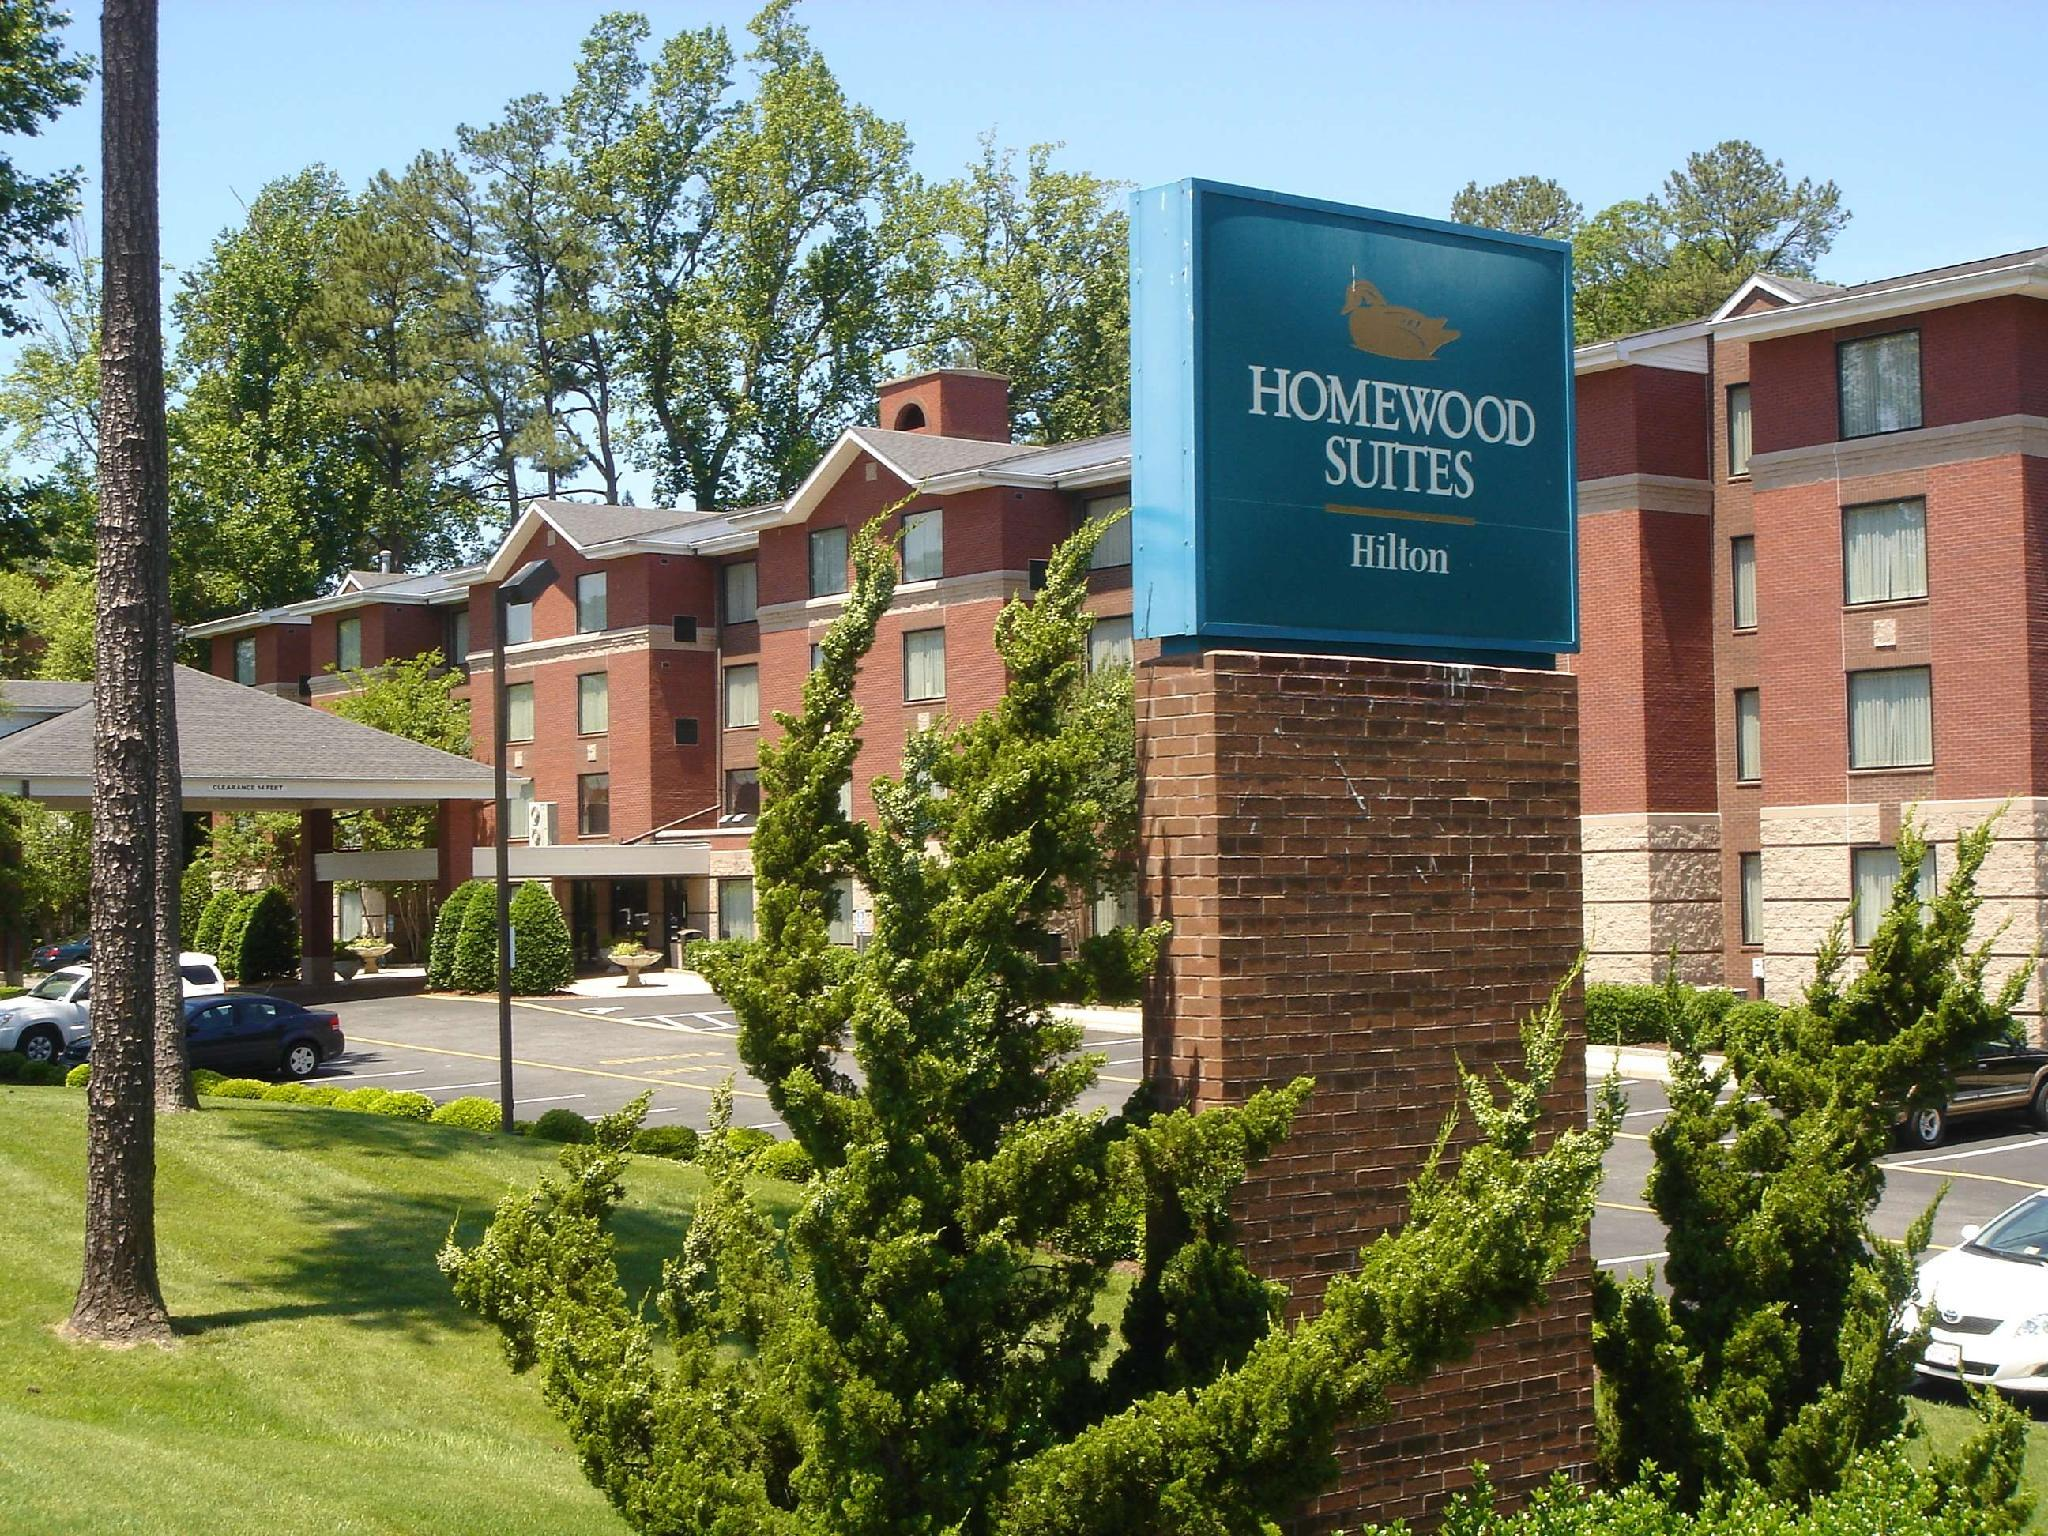 Homewood suites williamsburg hotel in williamsburg va room deals photos reviews for 2 bedroom suites williamsburg va